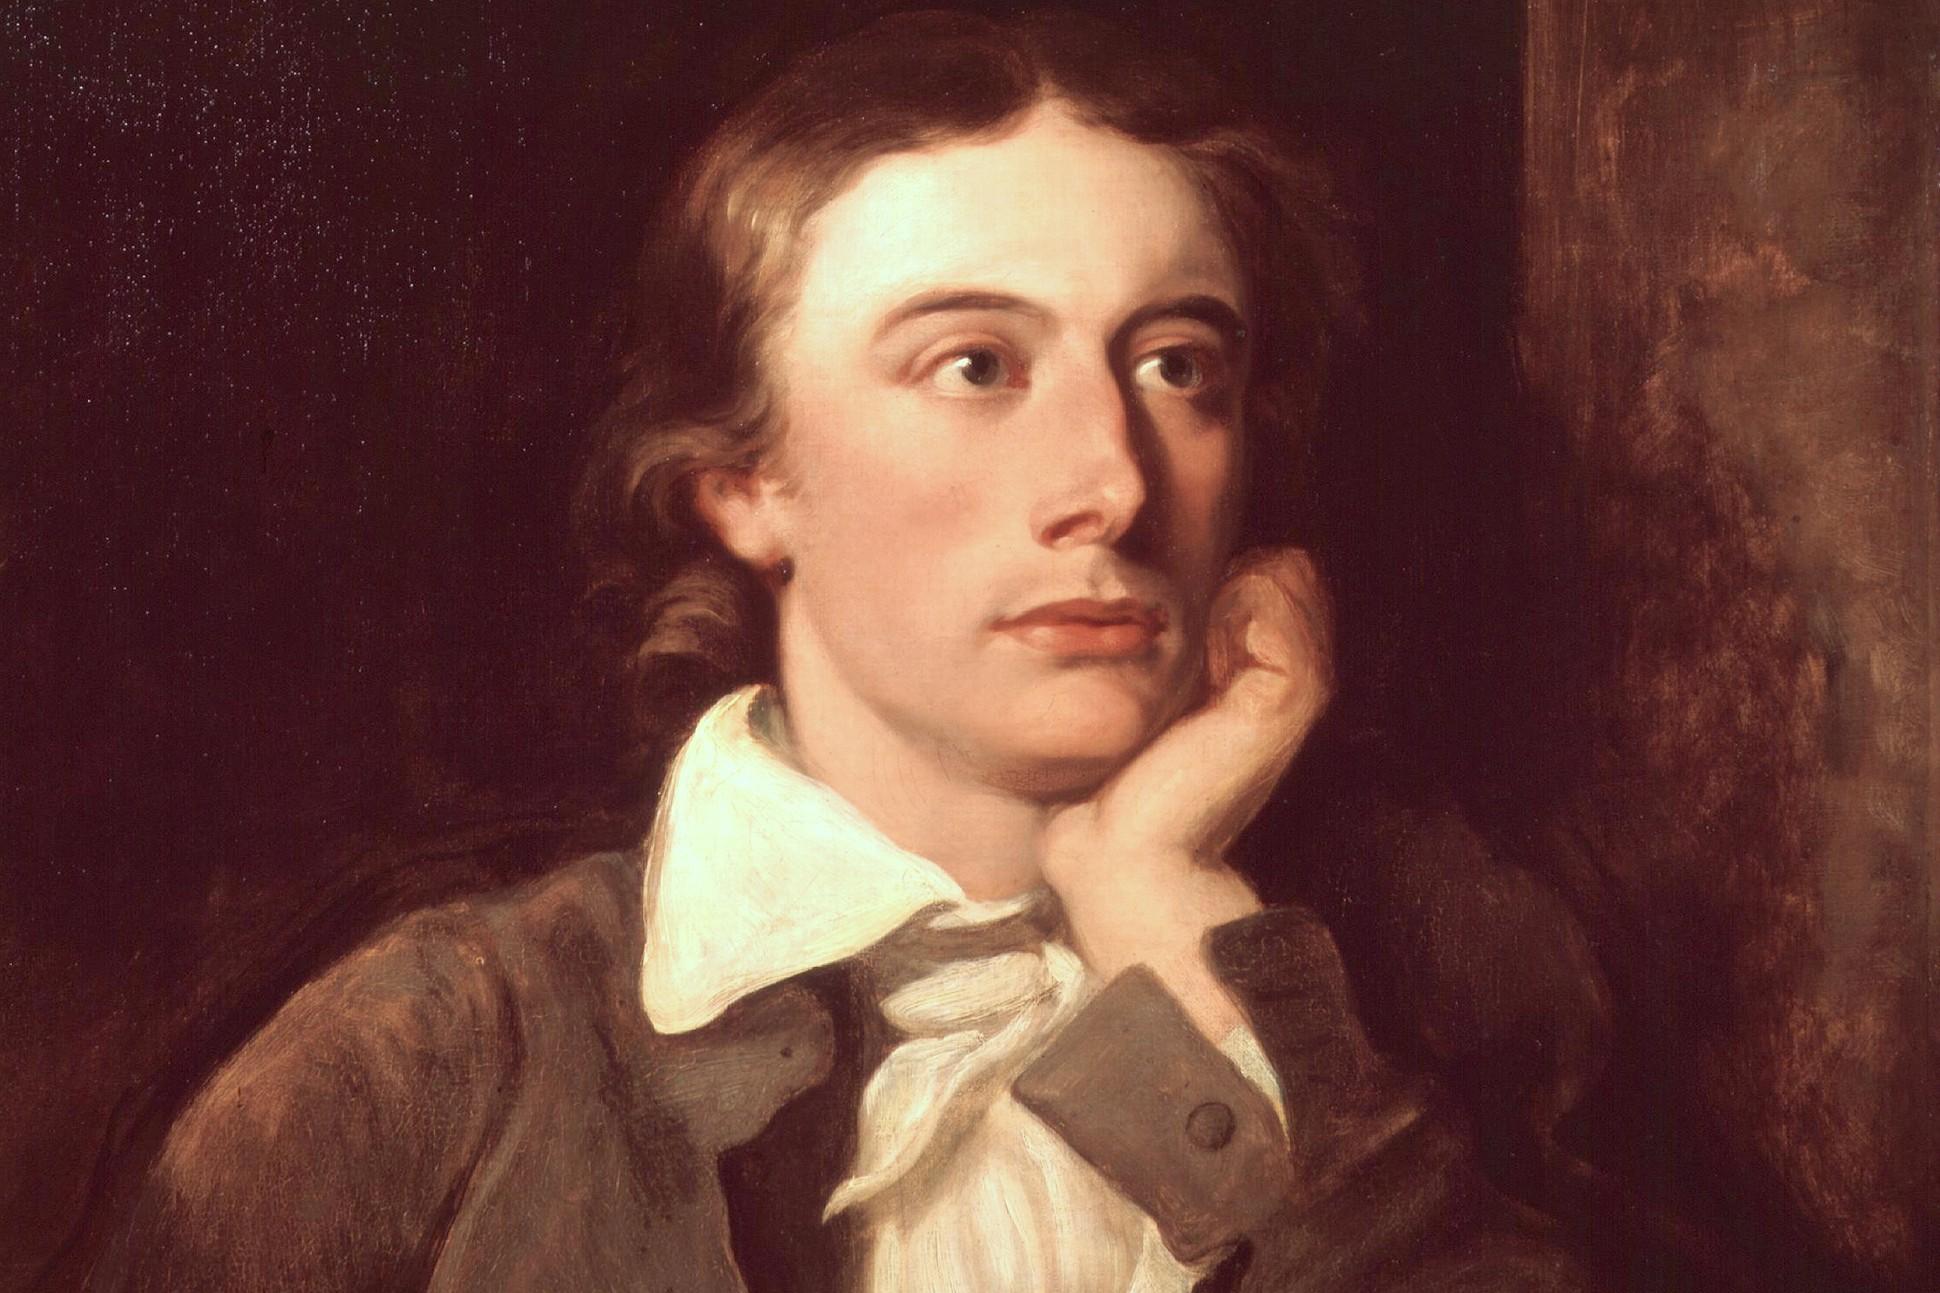 John Keats Poetry Foundation